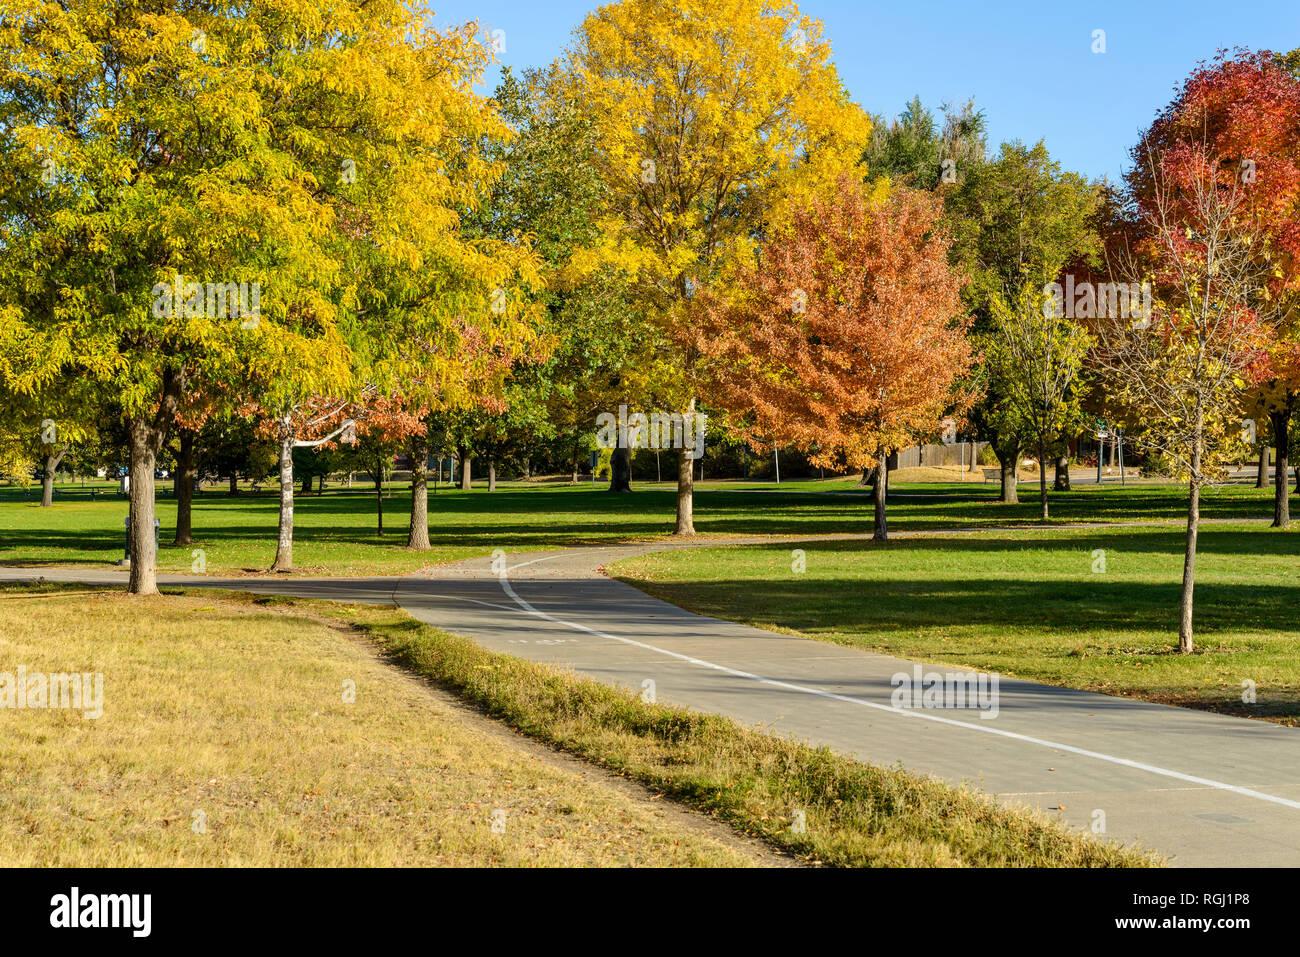 Autumn Park - Autumn afternoon at a city park, Denver-Lakewood, Colorado, USA. - Stock Image